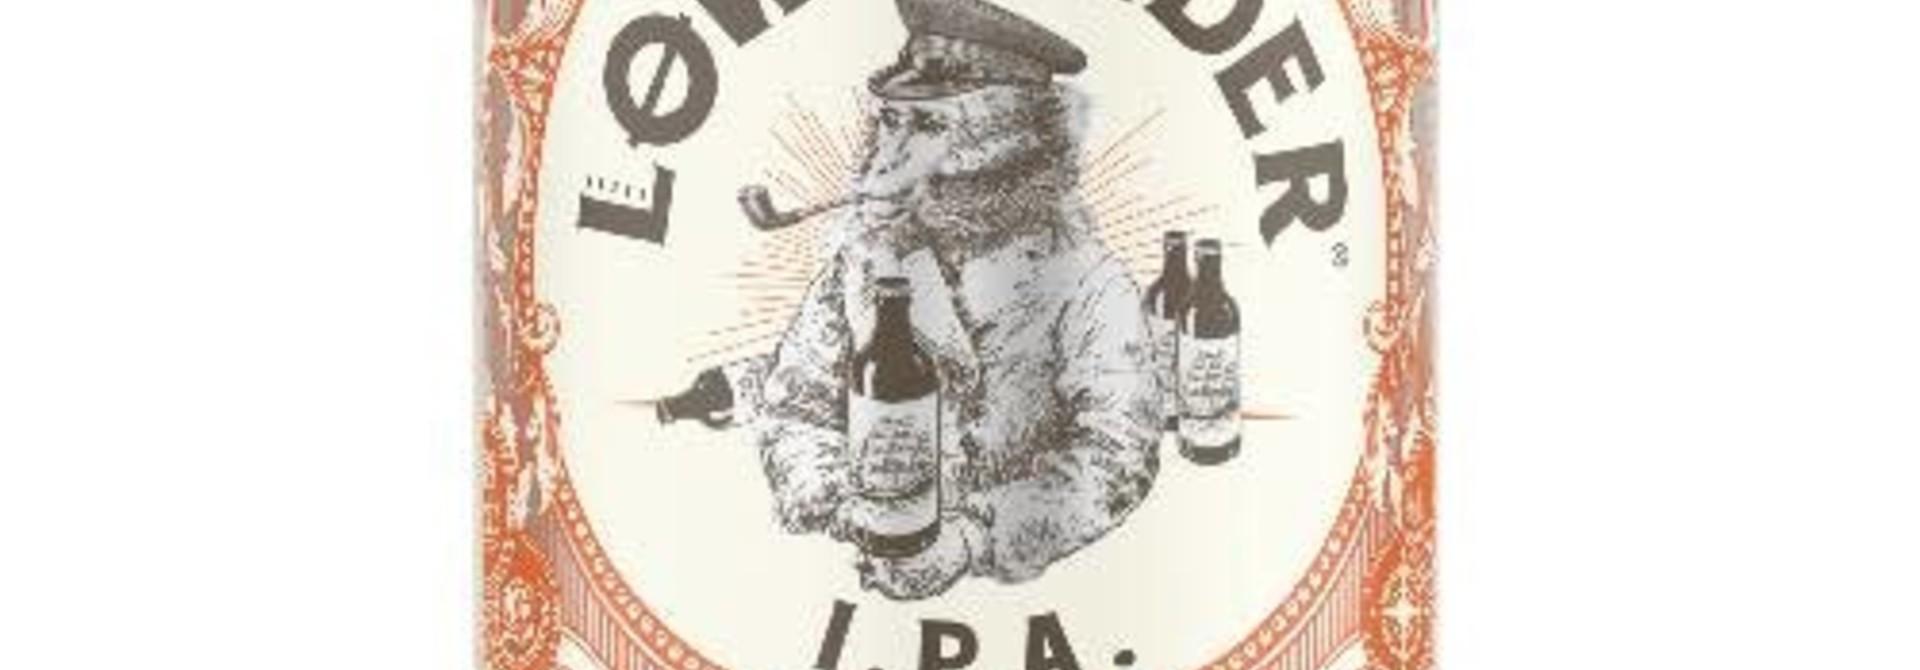 LOWLANDER IPA 33CL